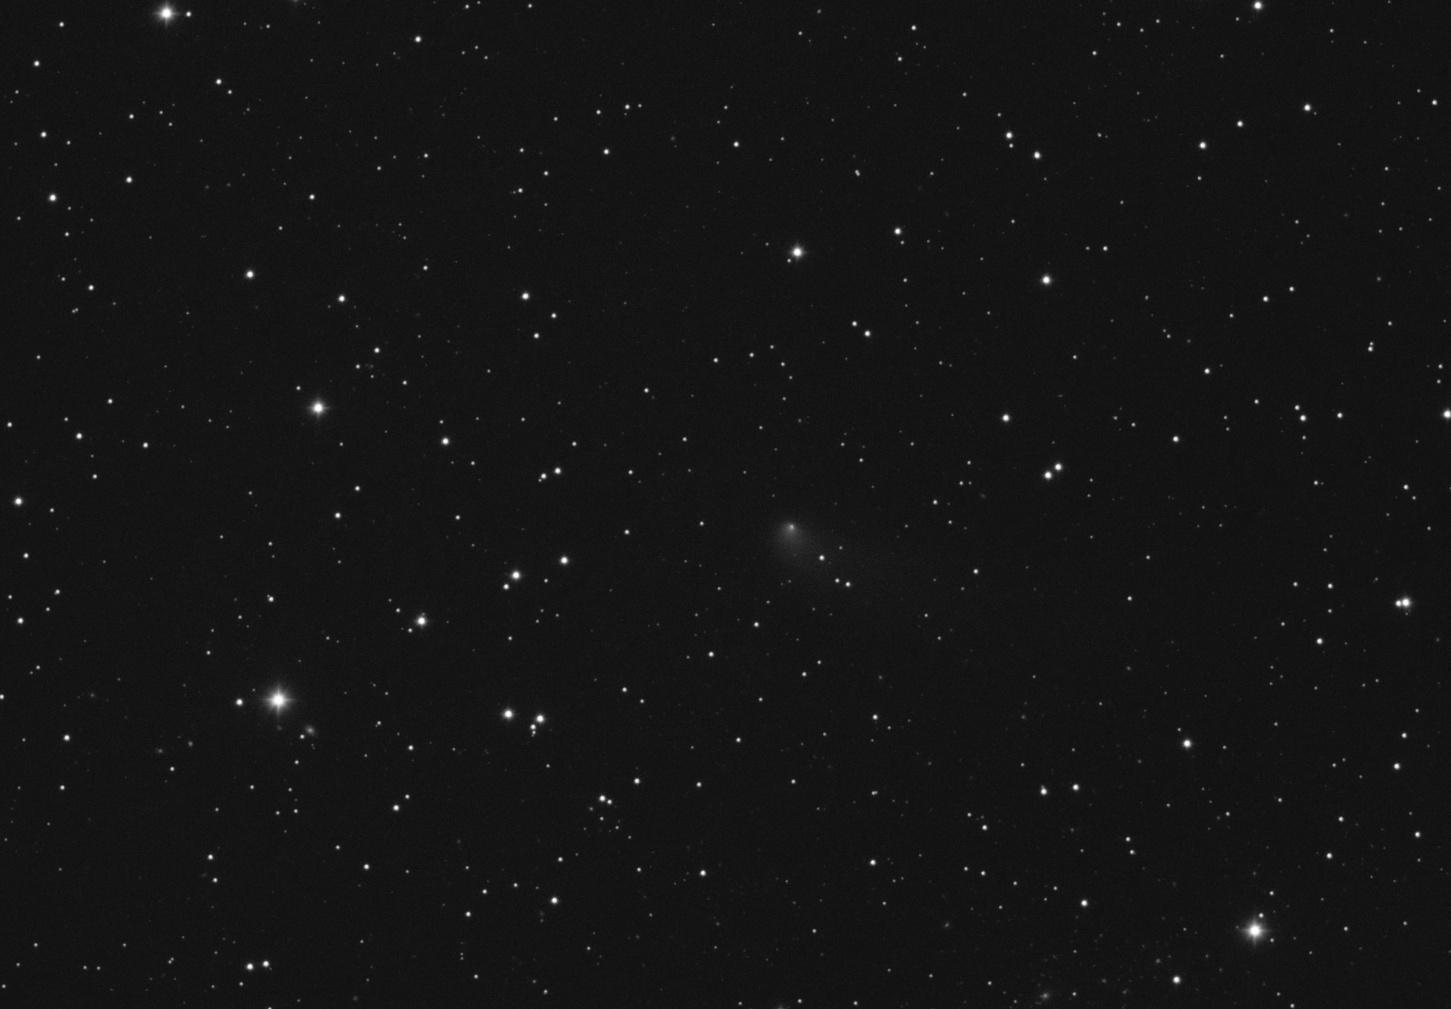 986526799_190212KometaStephan-OtermaL40x120TS383w1.jpg.be3b84894e047d74f9415e6aa016d392.jpg